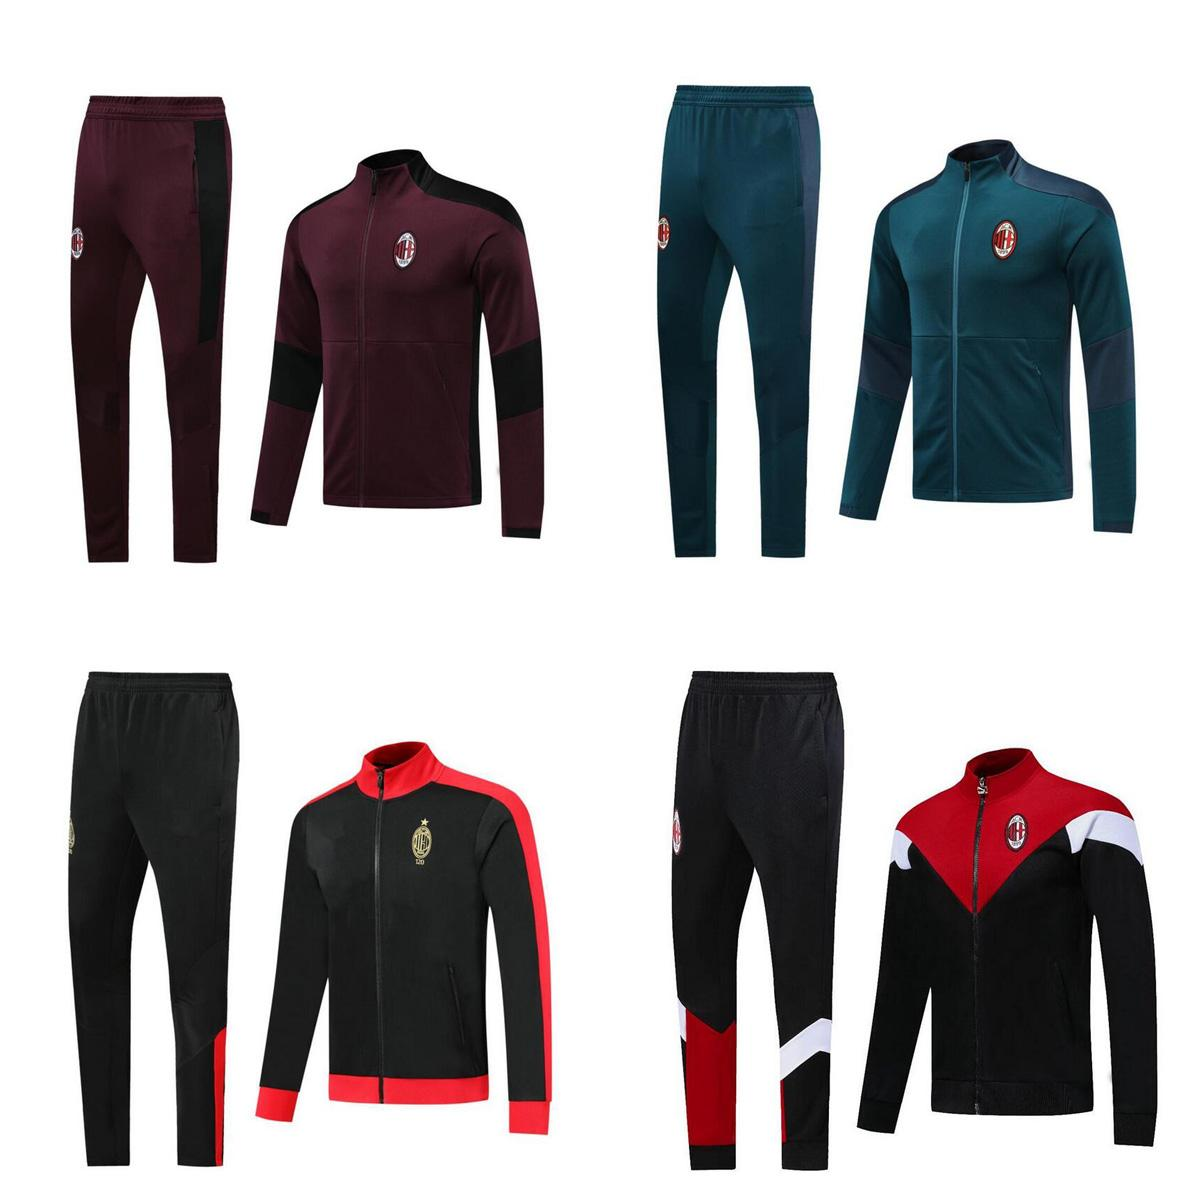 2020 2021 AC PIATEK KAKA Soccer training suit jacket survetement 19 20 maillot de foot IBRAHIMOVIC mIlan football Tracksuit